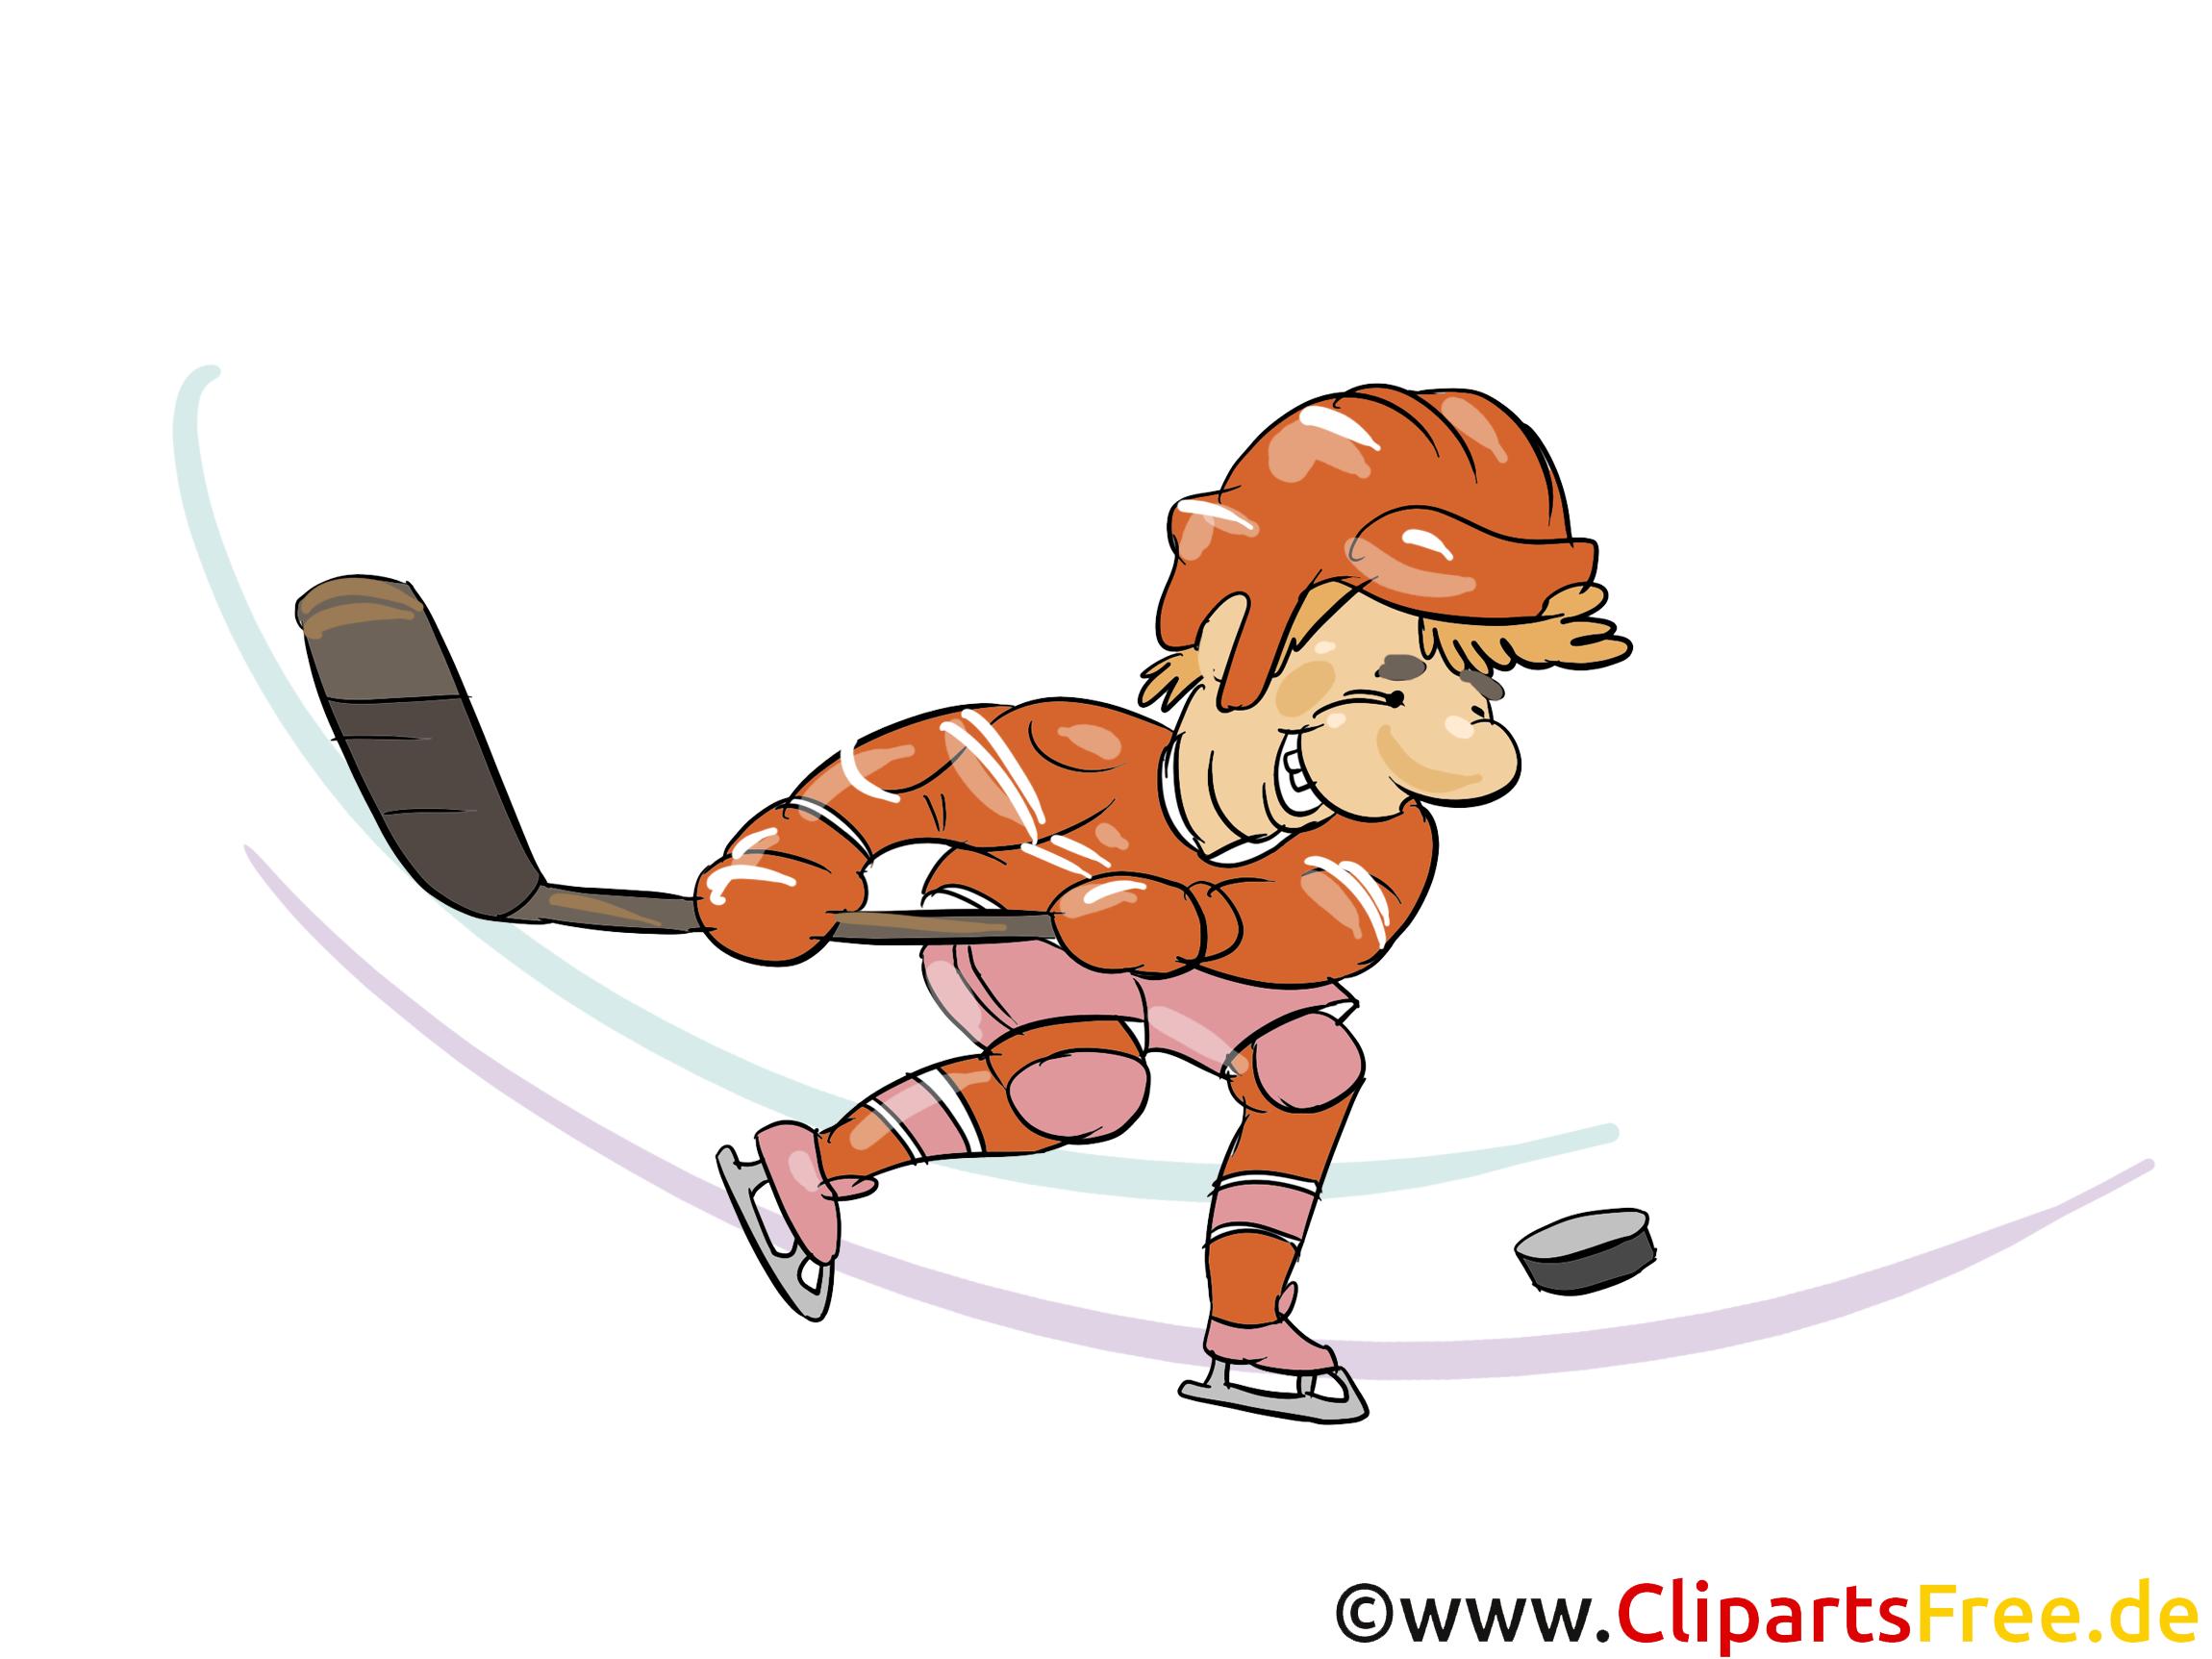 Eishockey Wurf ins Tor Clipart, Bild, Grfaik, Cartoon